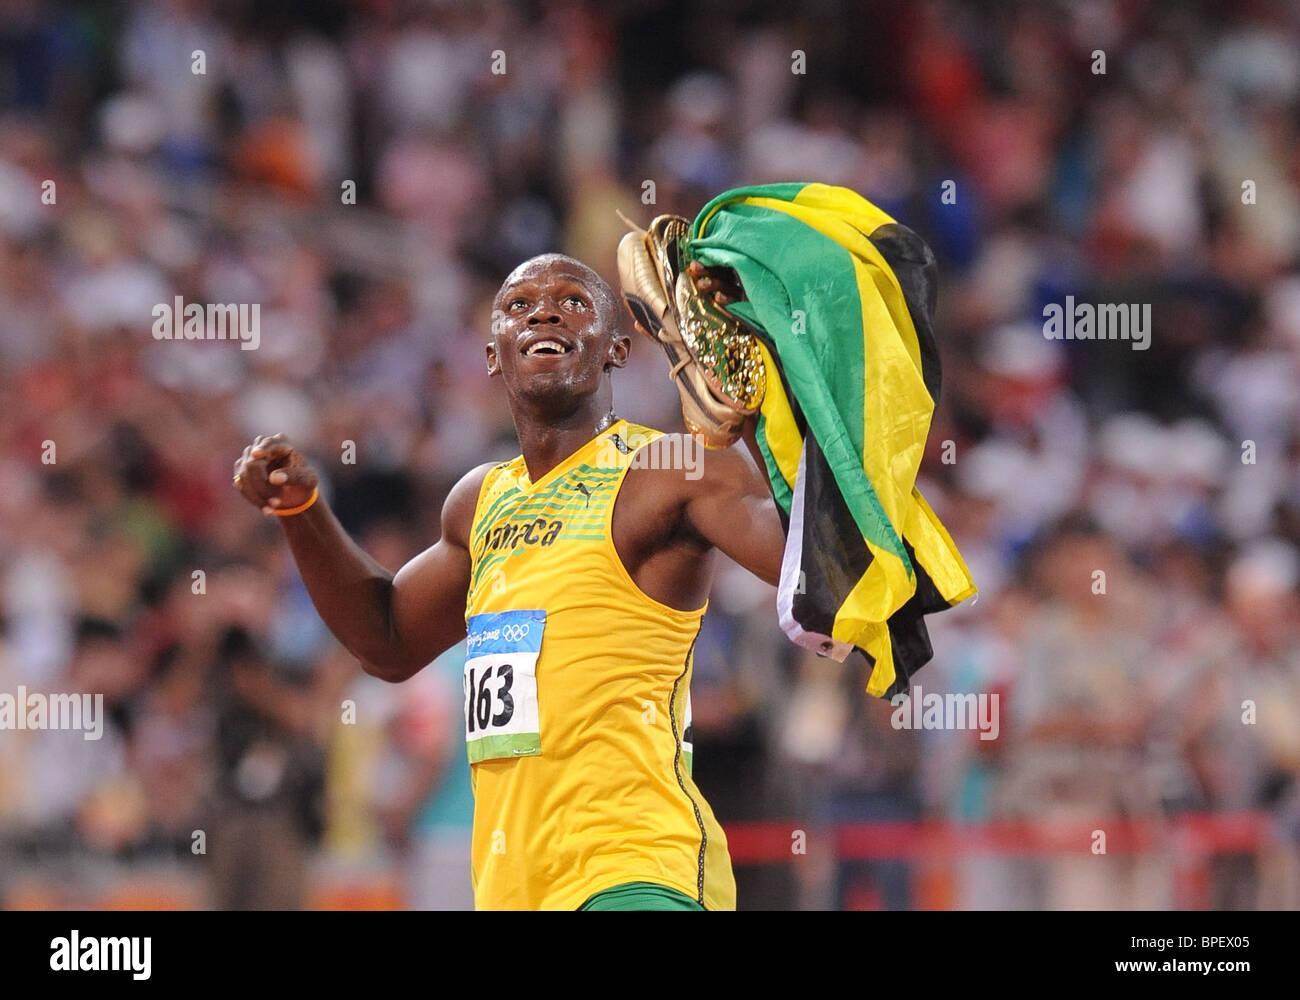 Men's 100-meter dash at Beijing Olympics - Stock Image